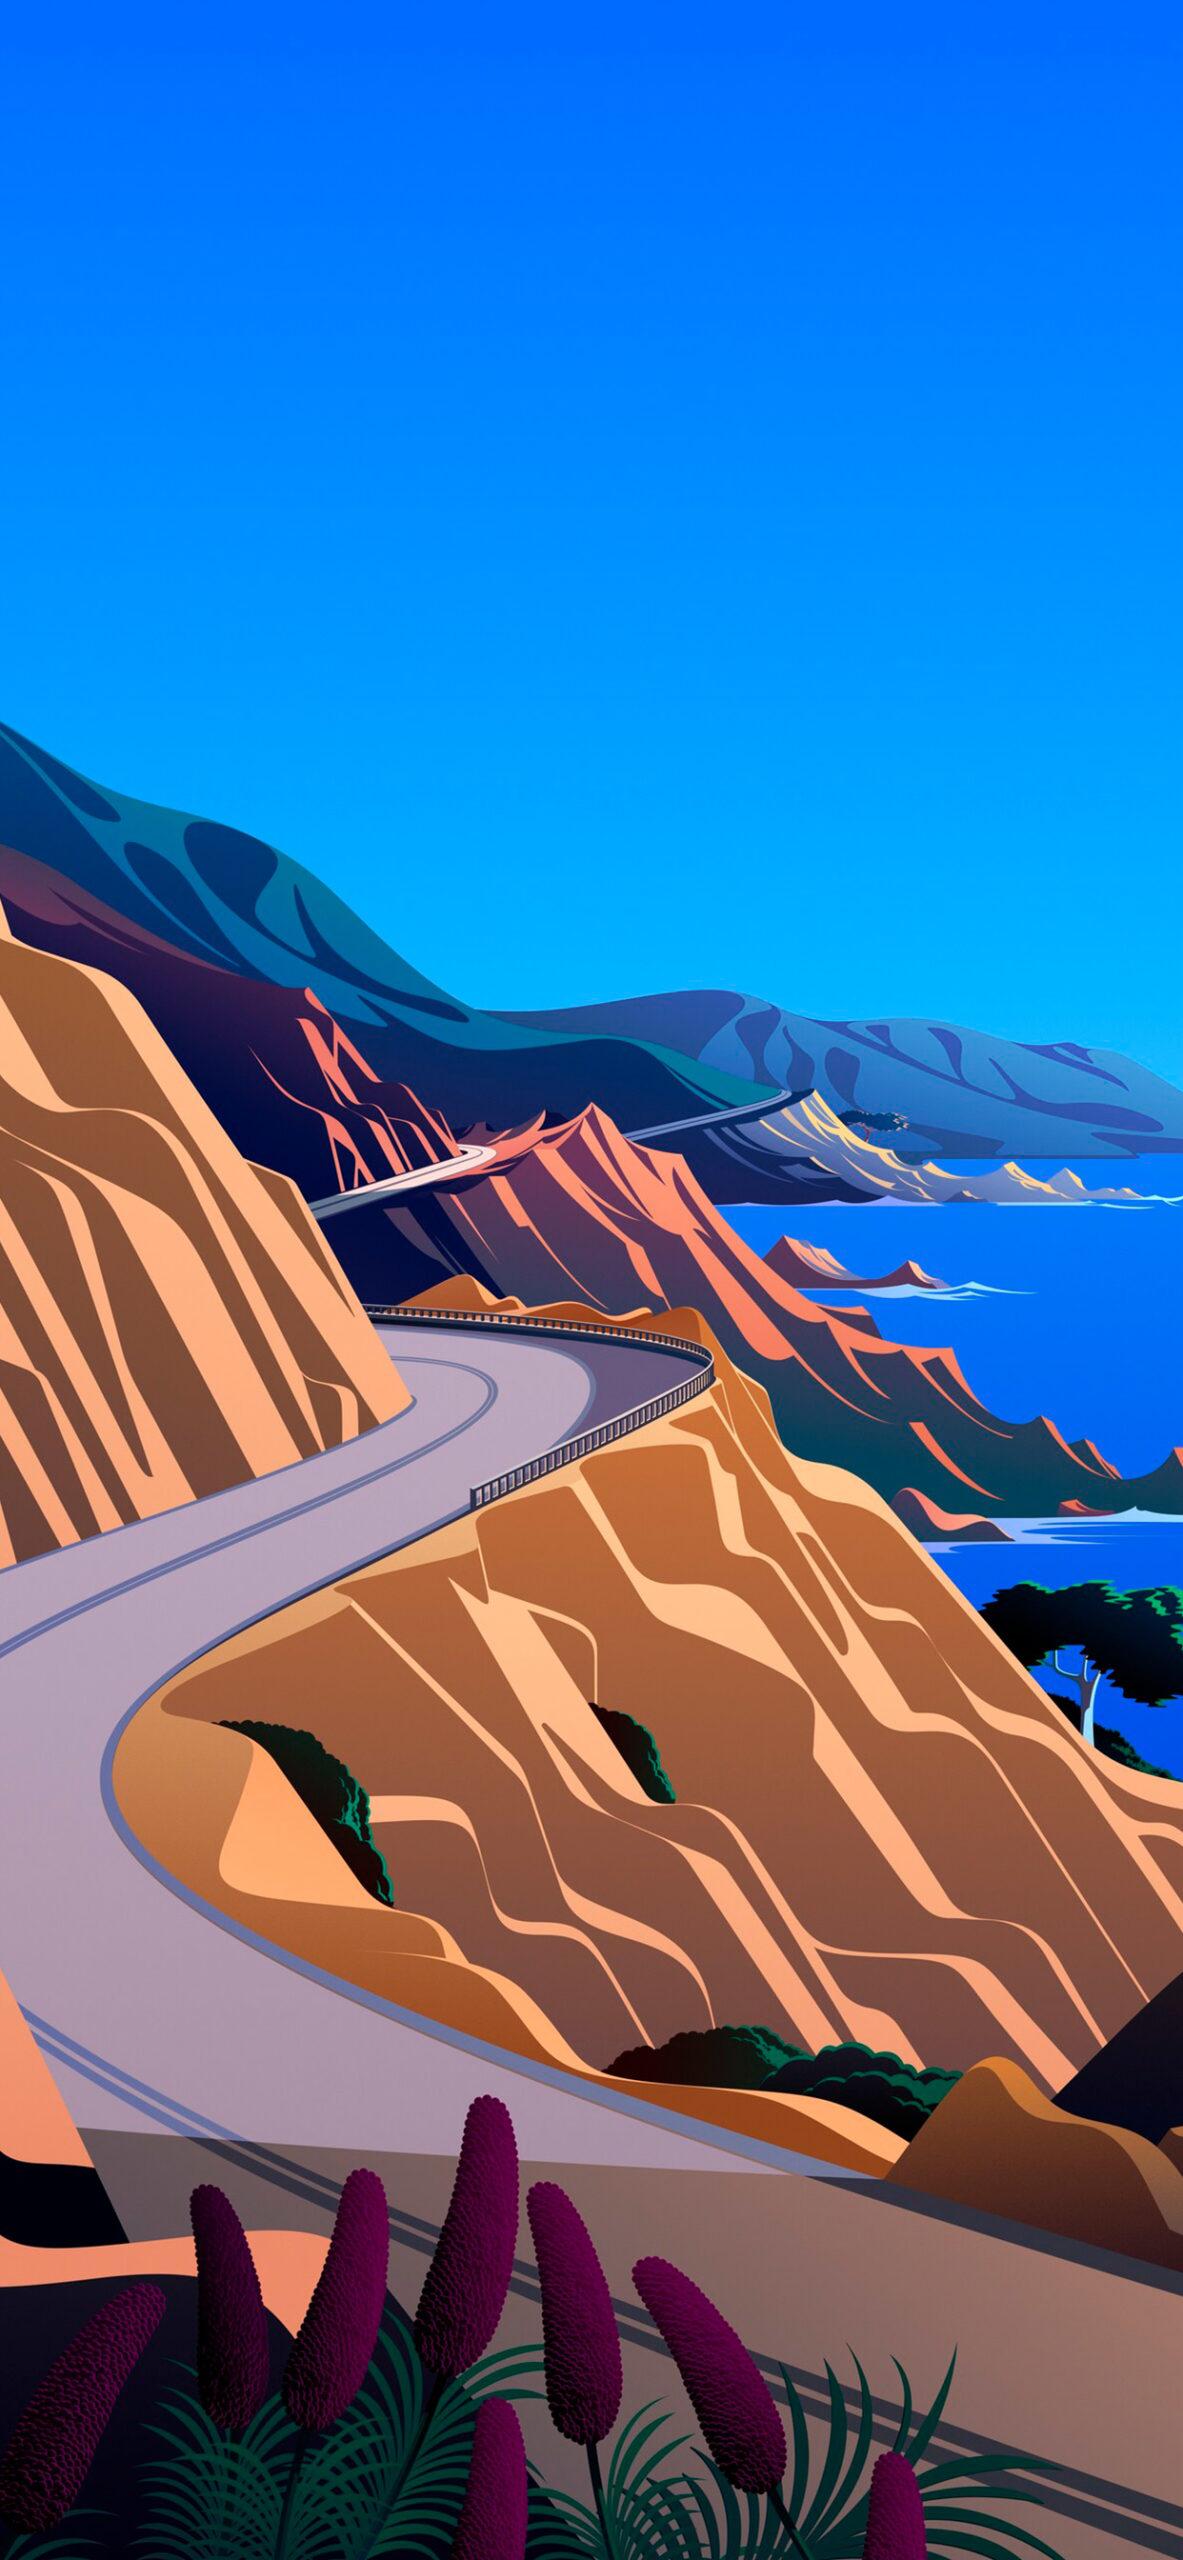 iphone wallpaper big sur cliffs3 scaled Mac OS Big Sur (Cliffs)